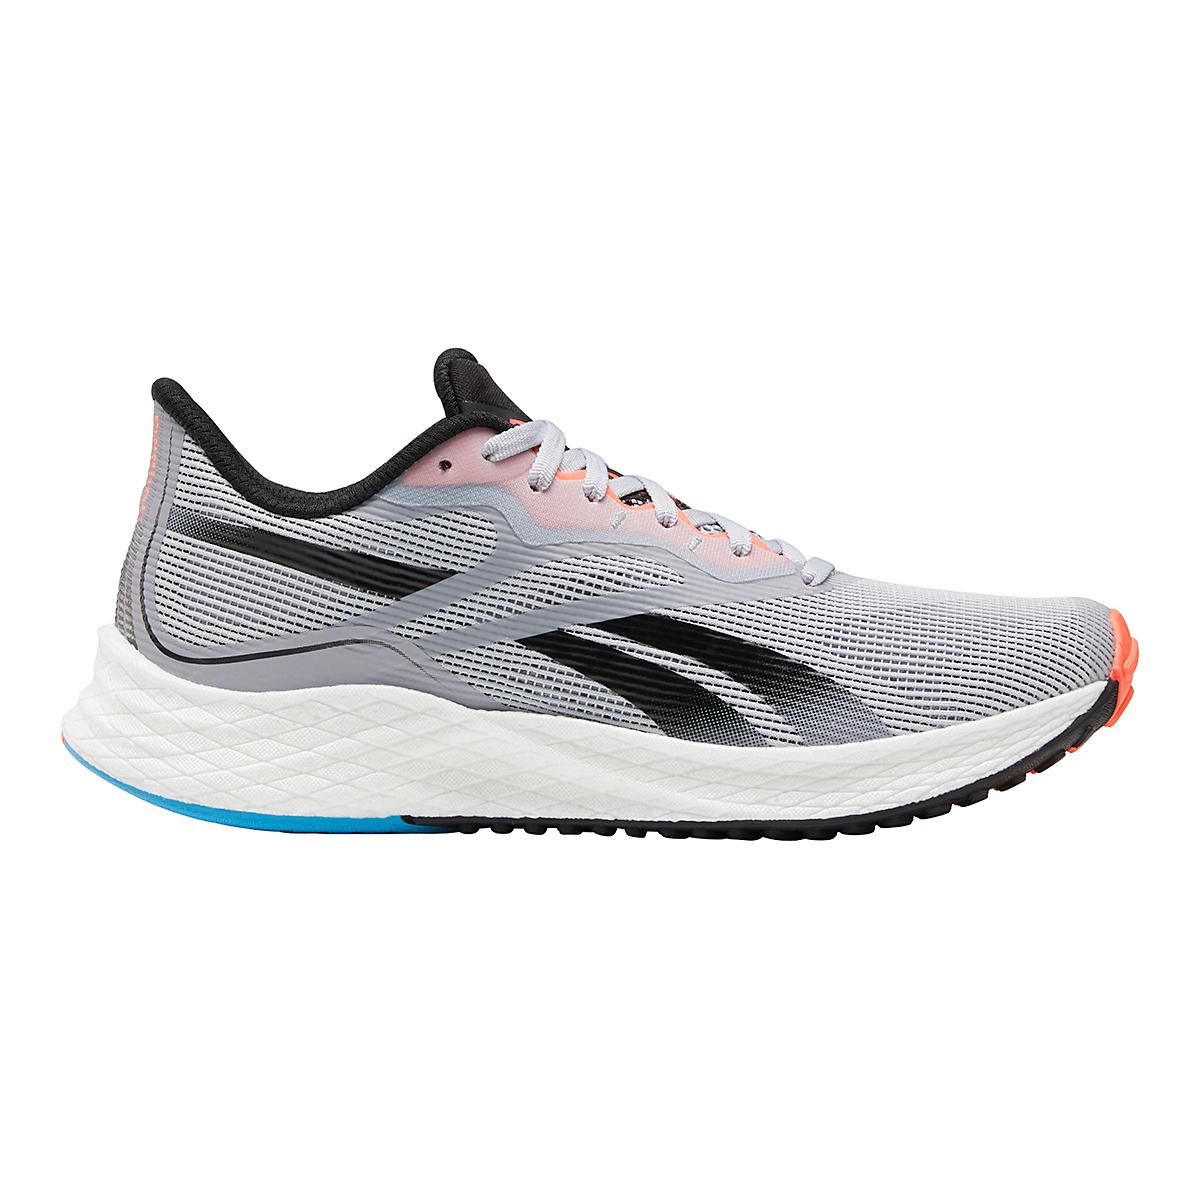 Women's Reebok Floatride Energy 3.0 Running Shoe - Color: Cold Grey/Core Black/Orange Flare - Size: 5 - Width: Regular, Cold Grey/Core Black/Orange Flare, large, image 1